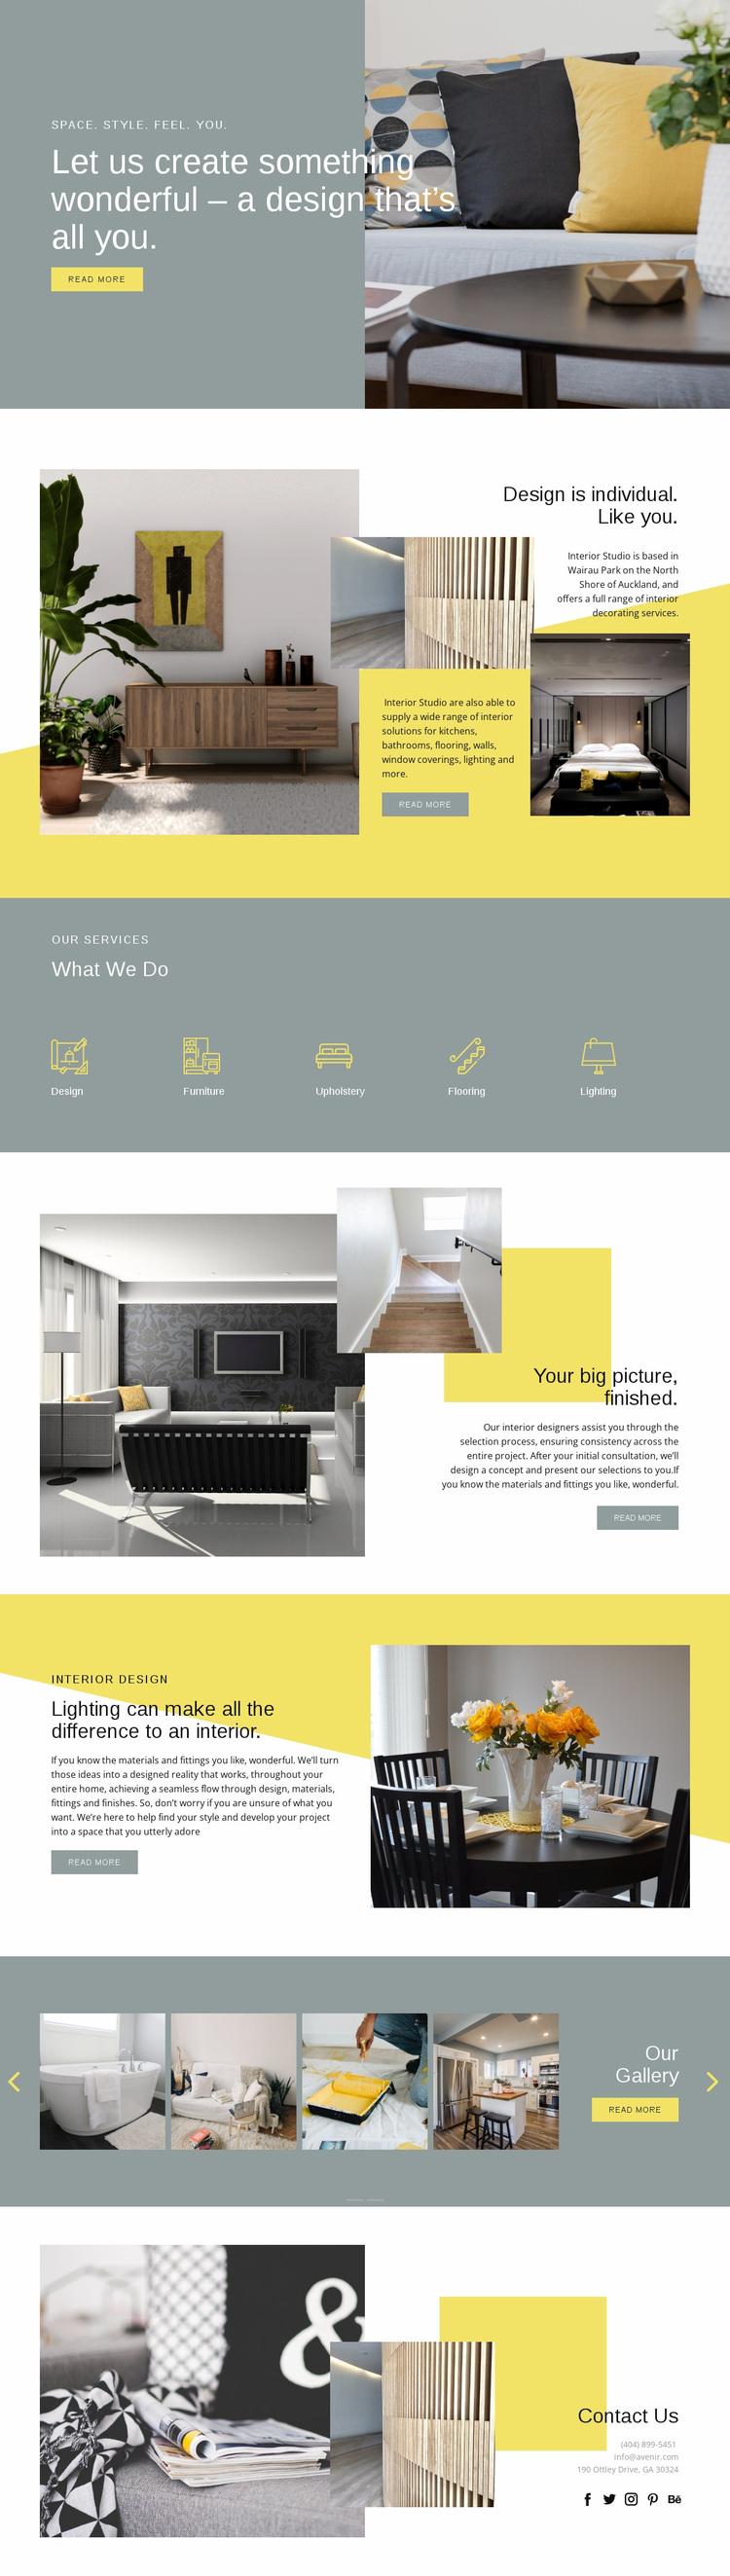 Design is your everything Website Design